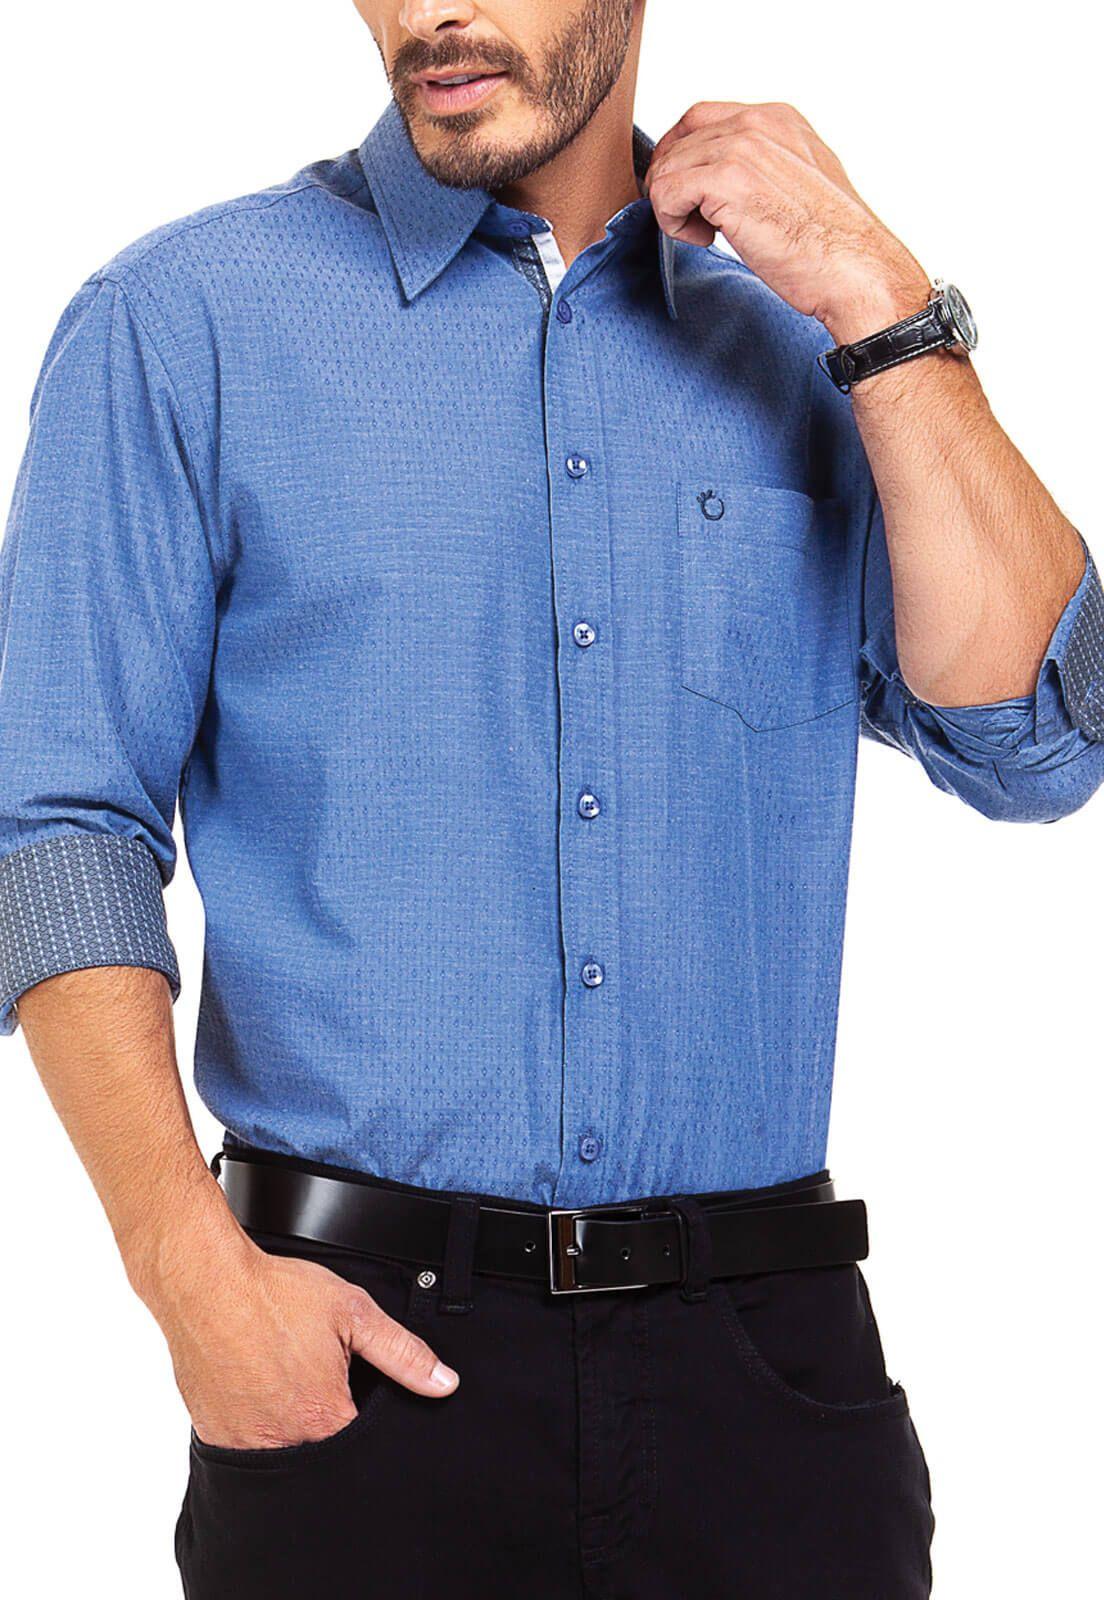 Camisa Social Masculina Olimpo Maquinetada com Bolso Manga Longa Azul